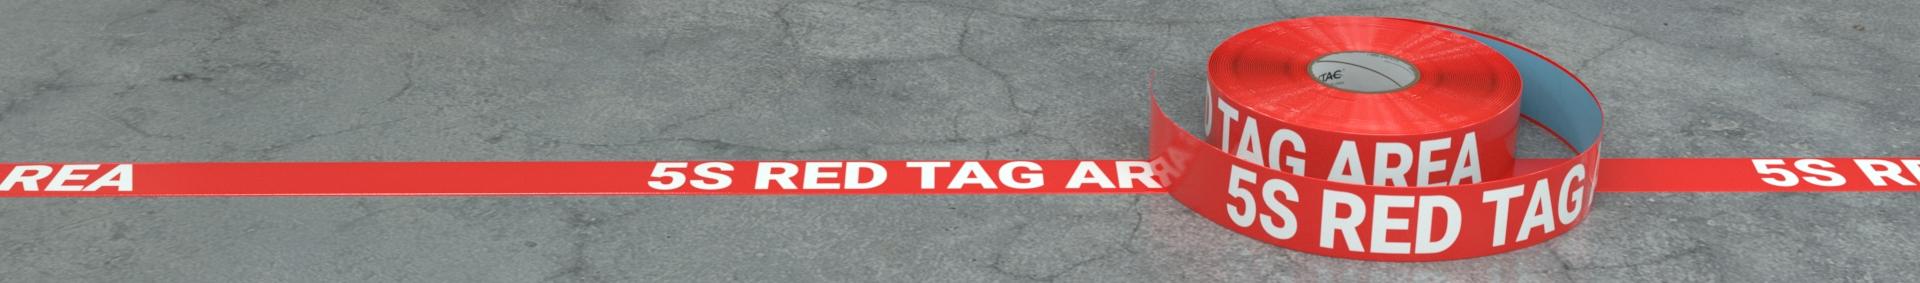 SafetyTac Inline Printed Tape